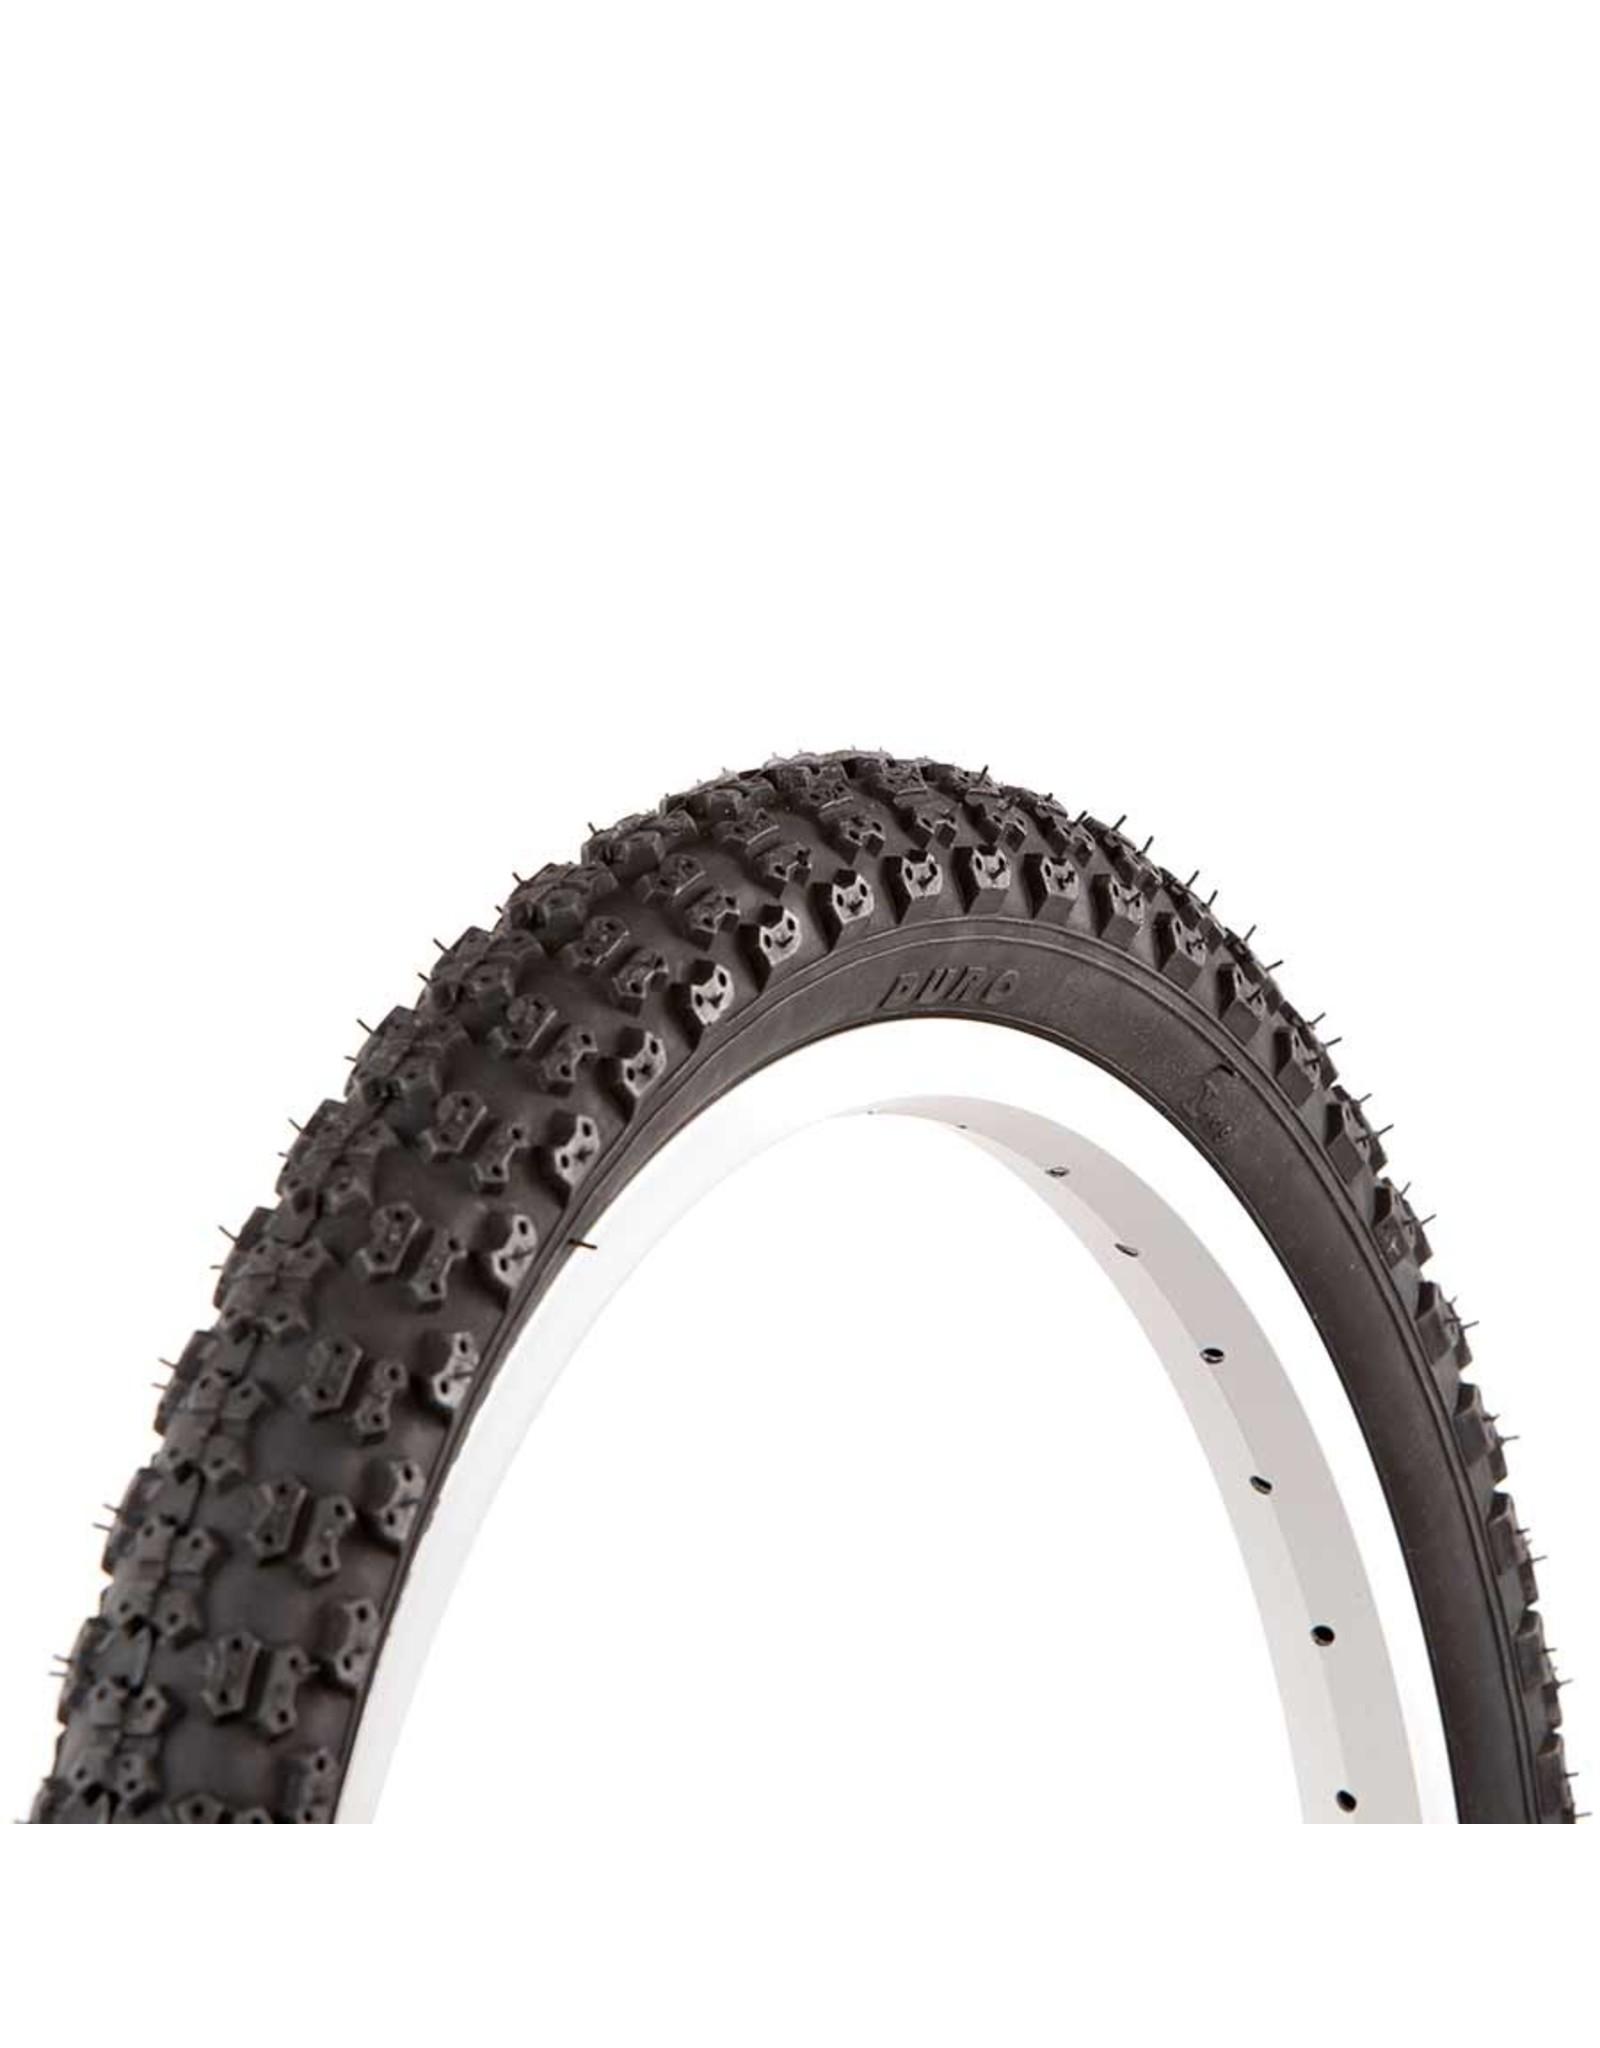 EVO EVO, Splash, Tire, 20''x1.75, Wire, Clincher, Black